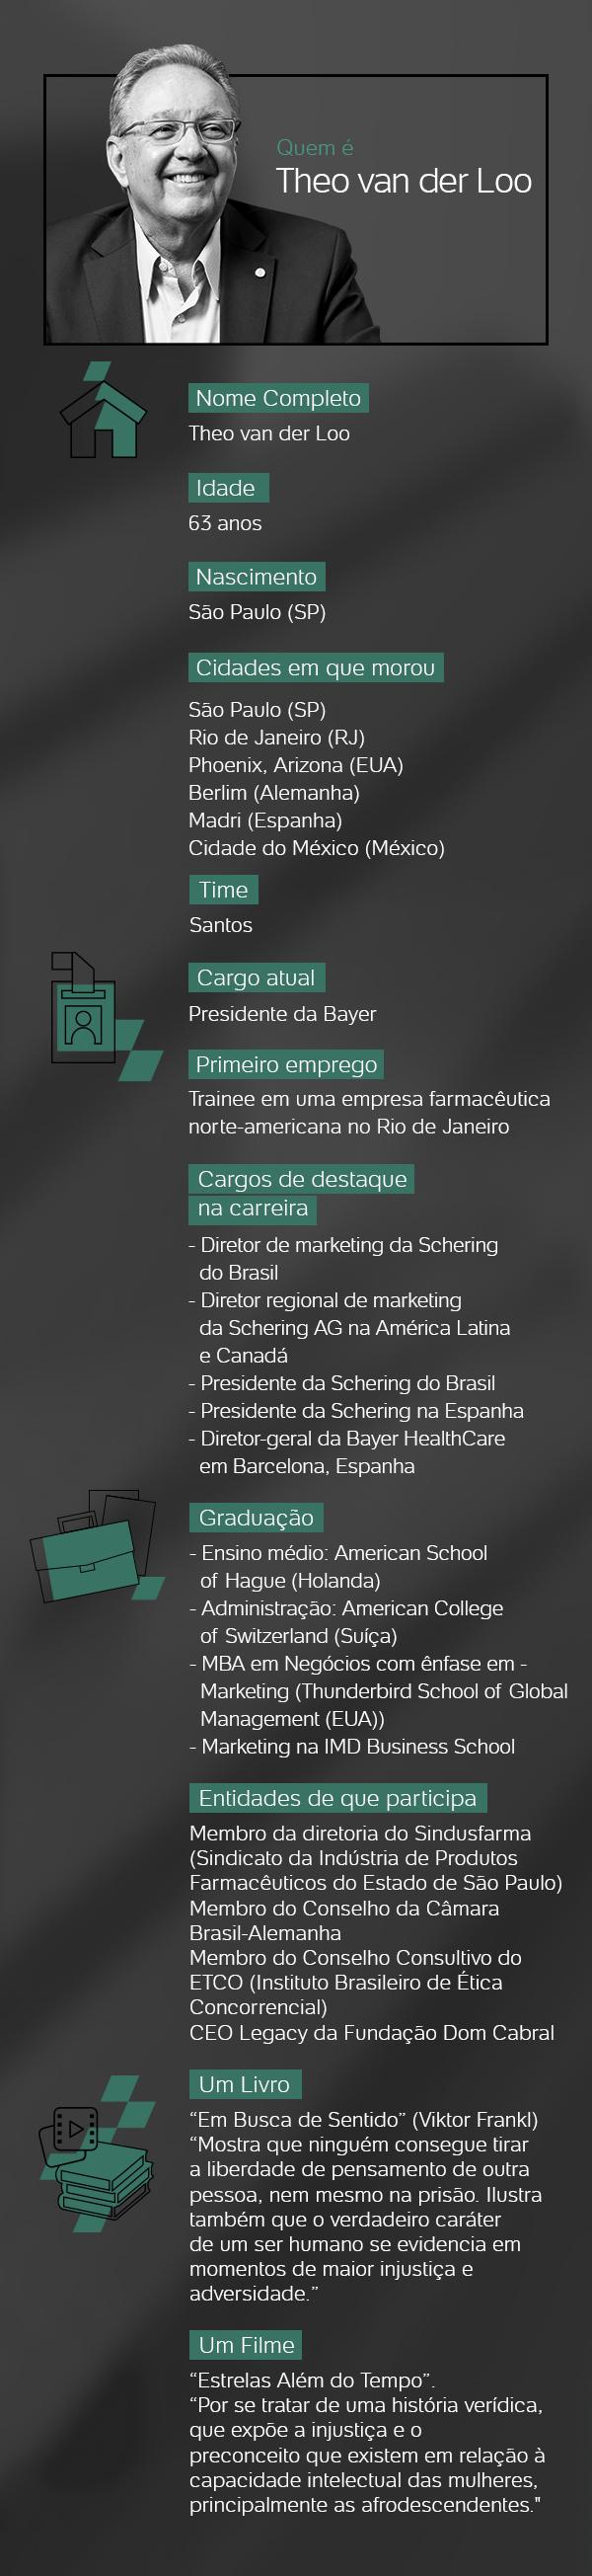 Marcelo Justo/UOL e Arte/UOL